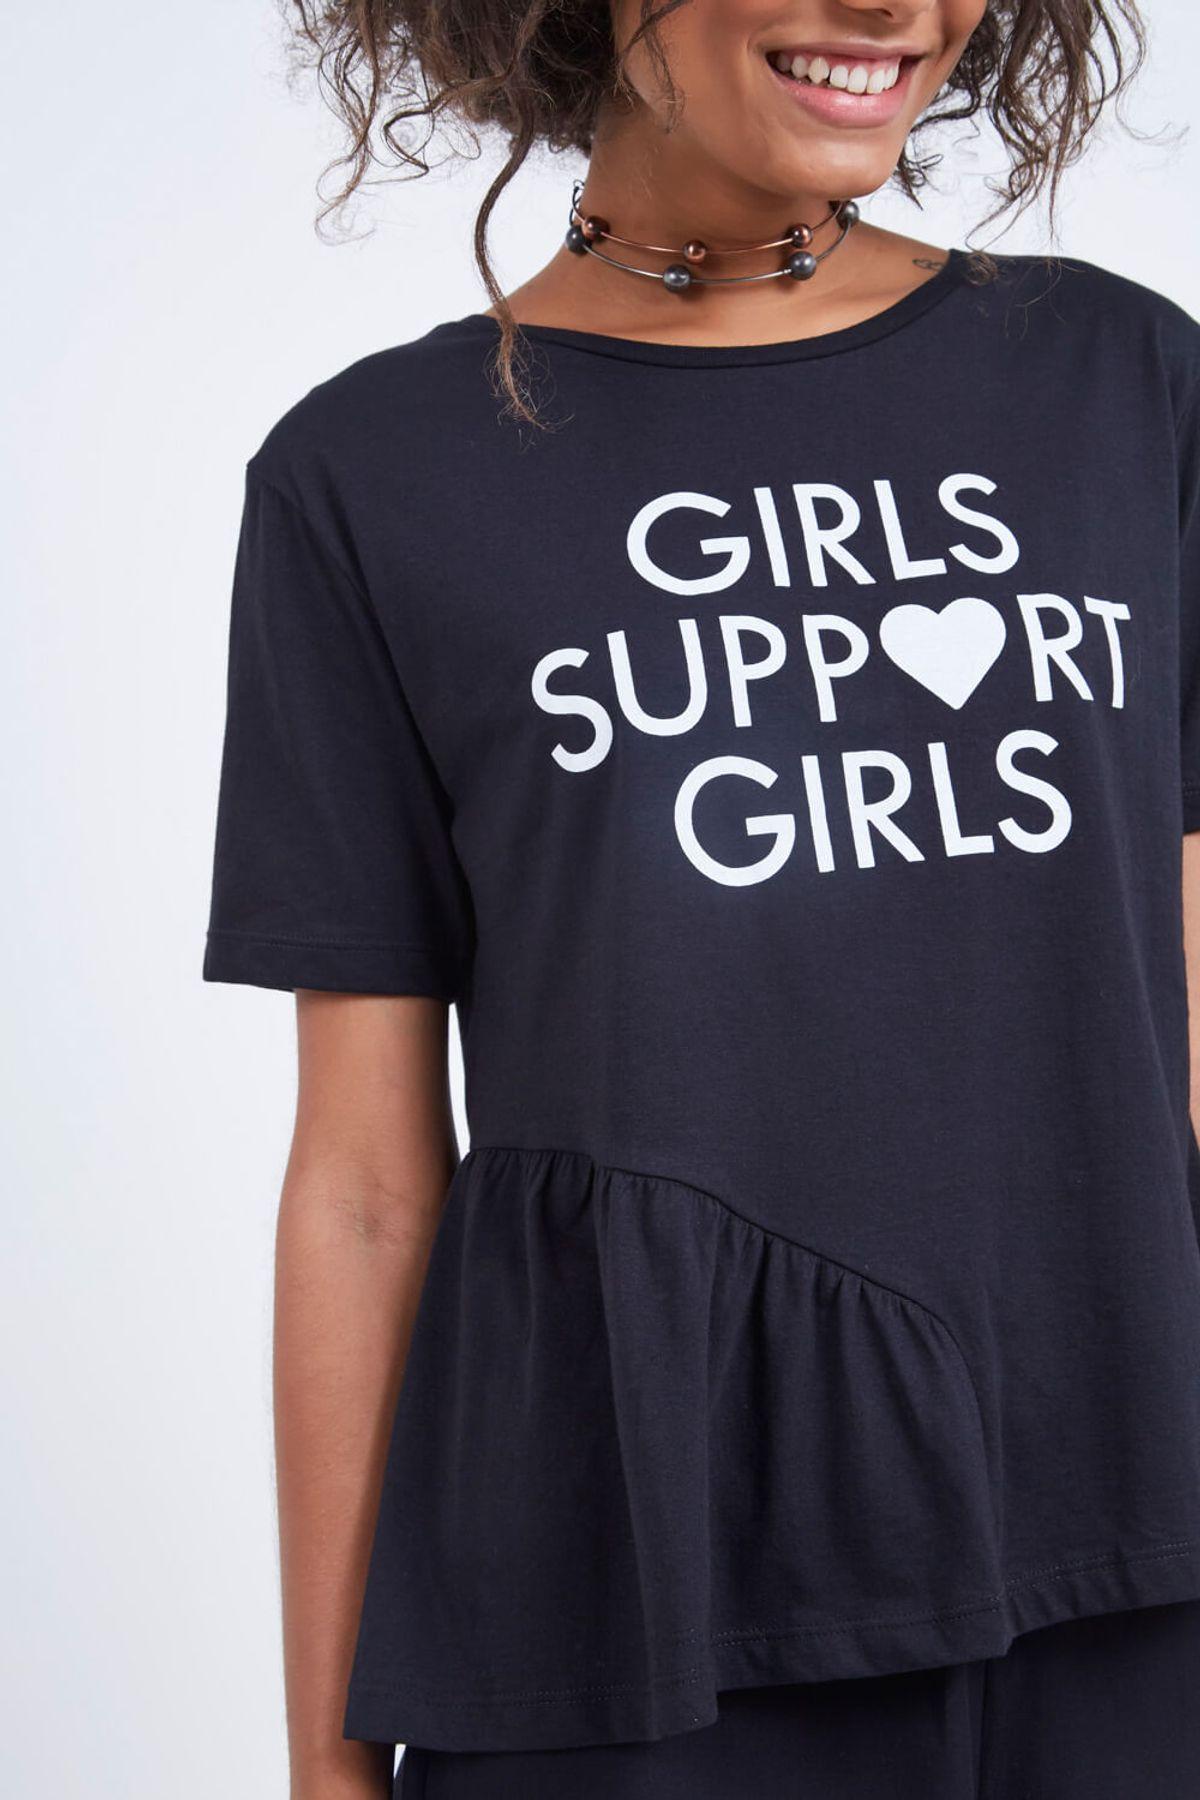 BLUSA-GIRLS-SUPPORT-GIRLS-020208500002-OH-BOY